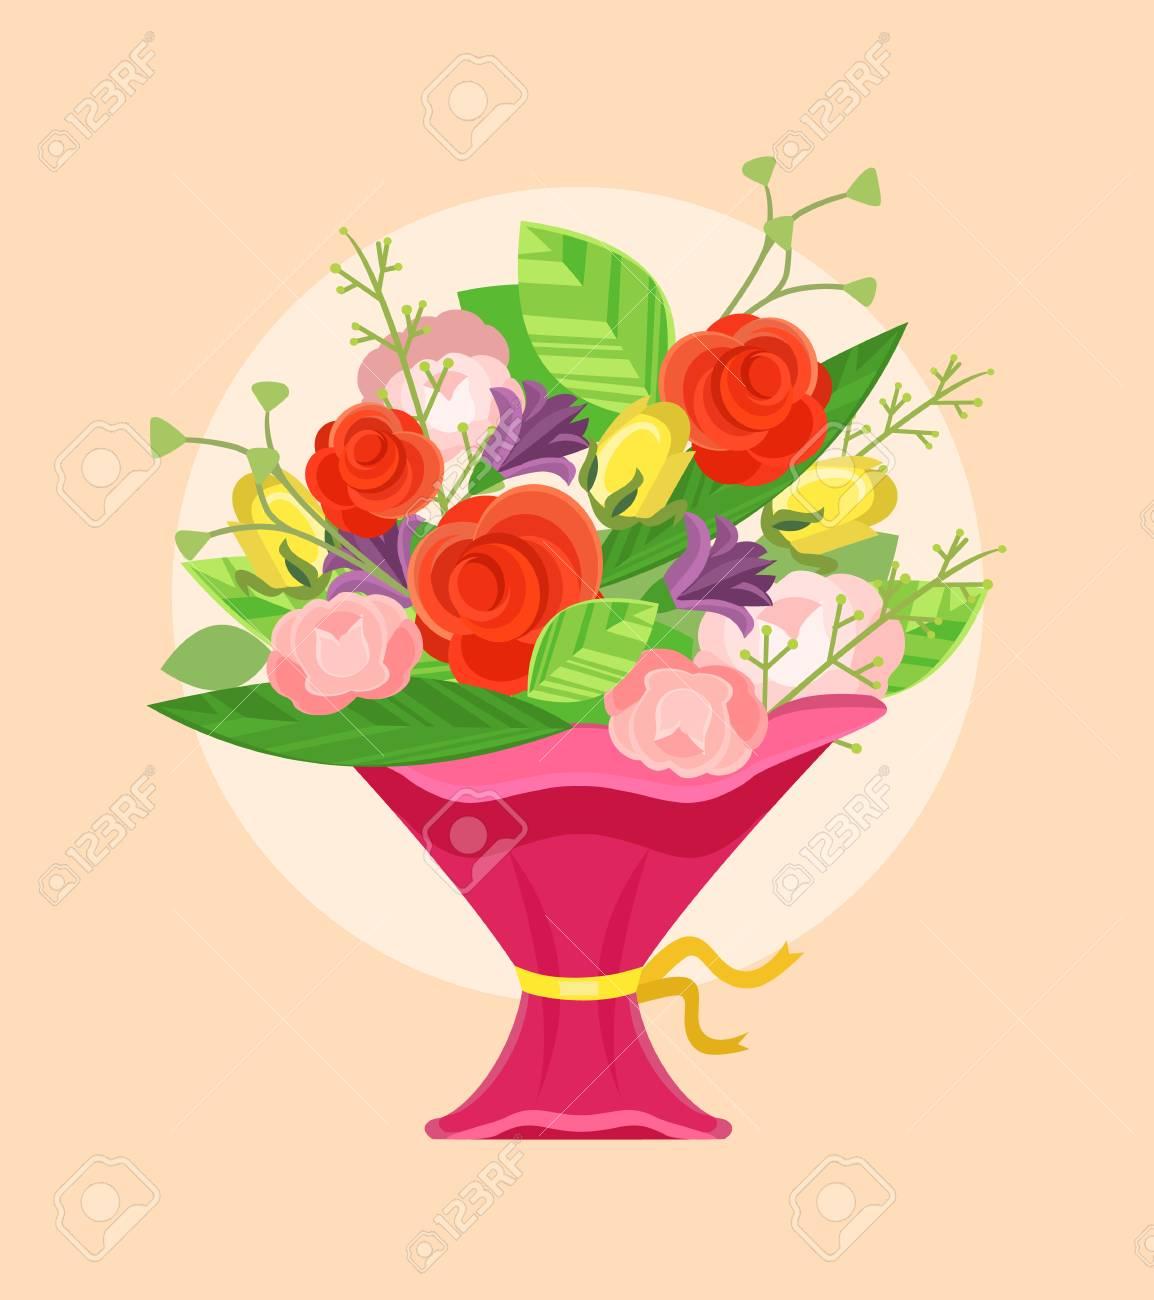 Bouquet Of Flowers Vector Flat Cartoon Illustration Royalty Free